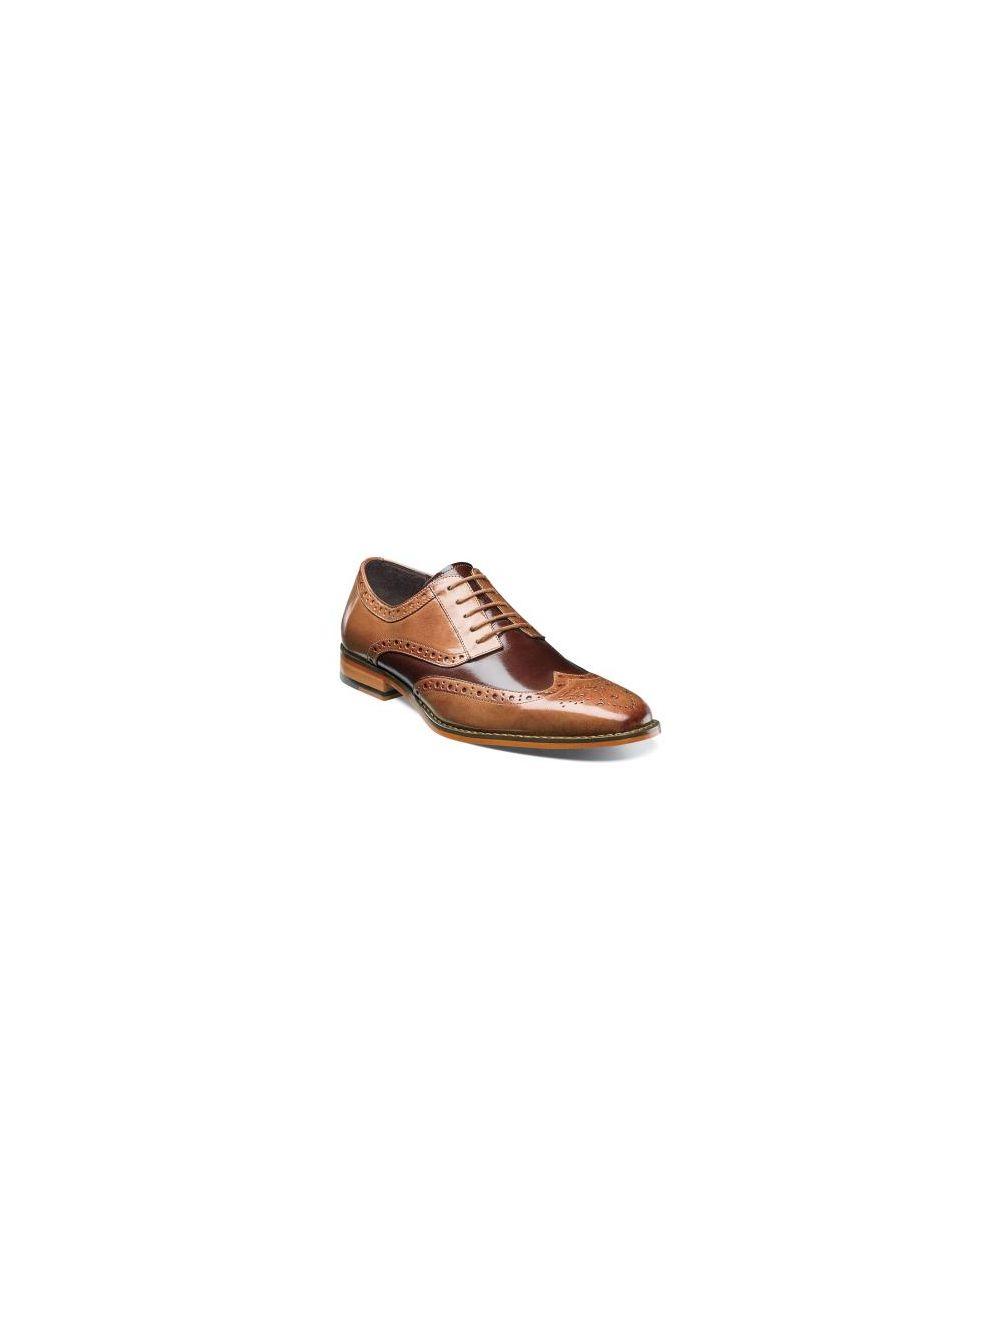 Men/'s Stacy Adams Tinsley Tan and Brown Wingtip Dress Shoe 25092-238